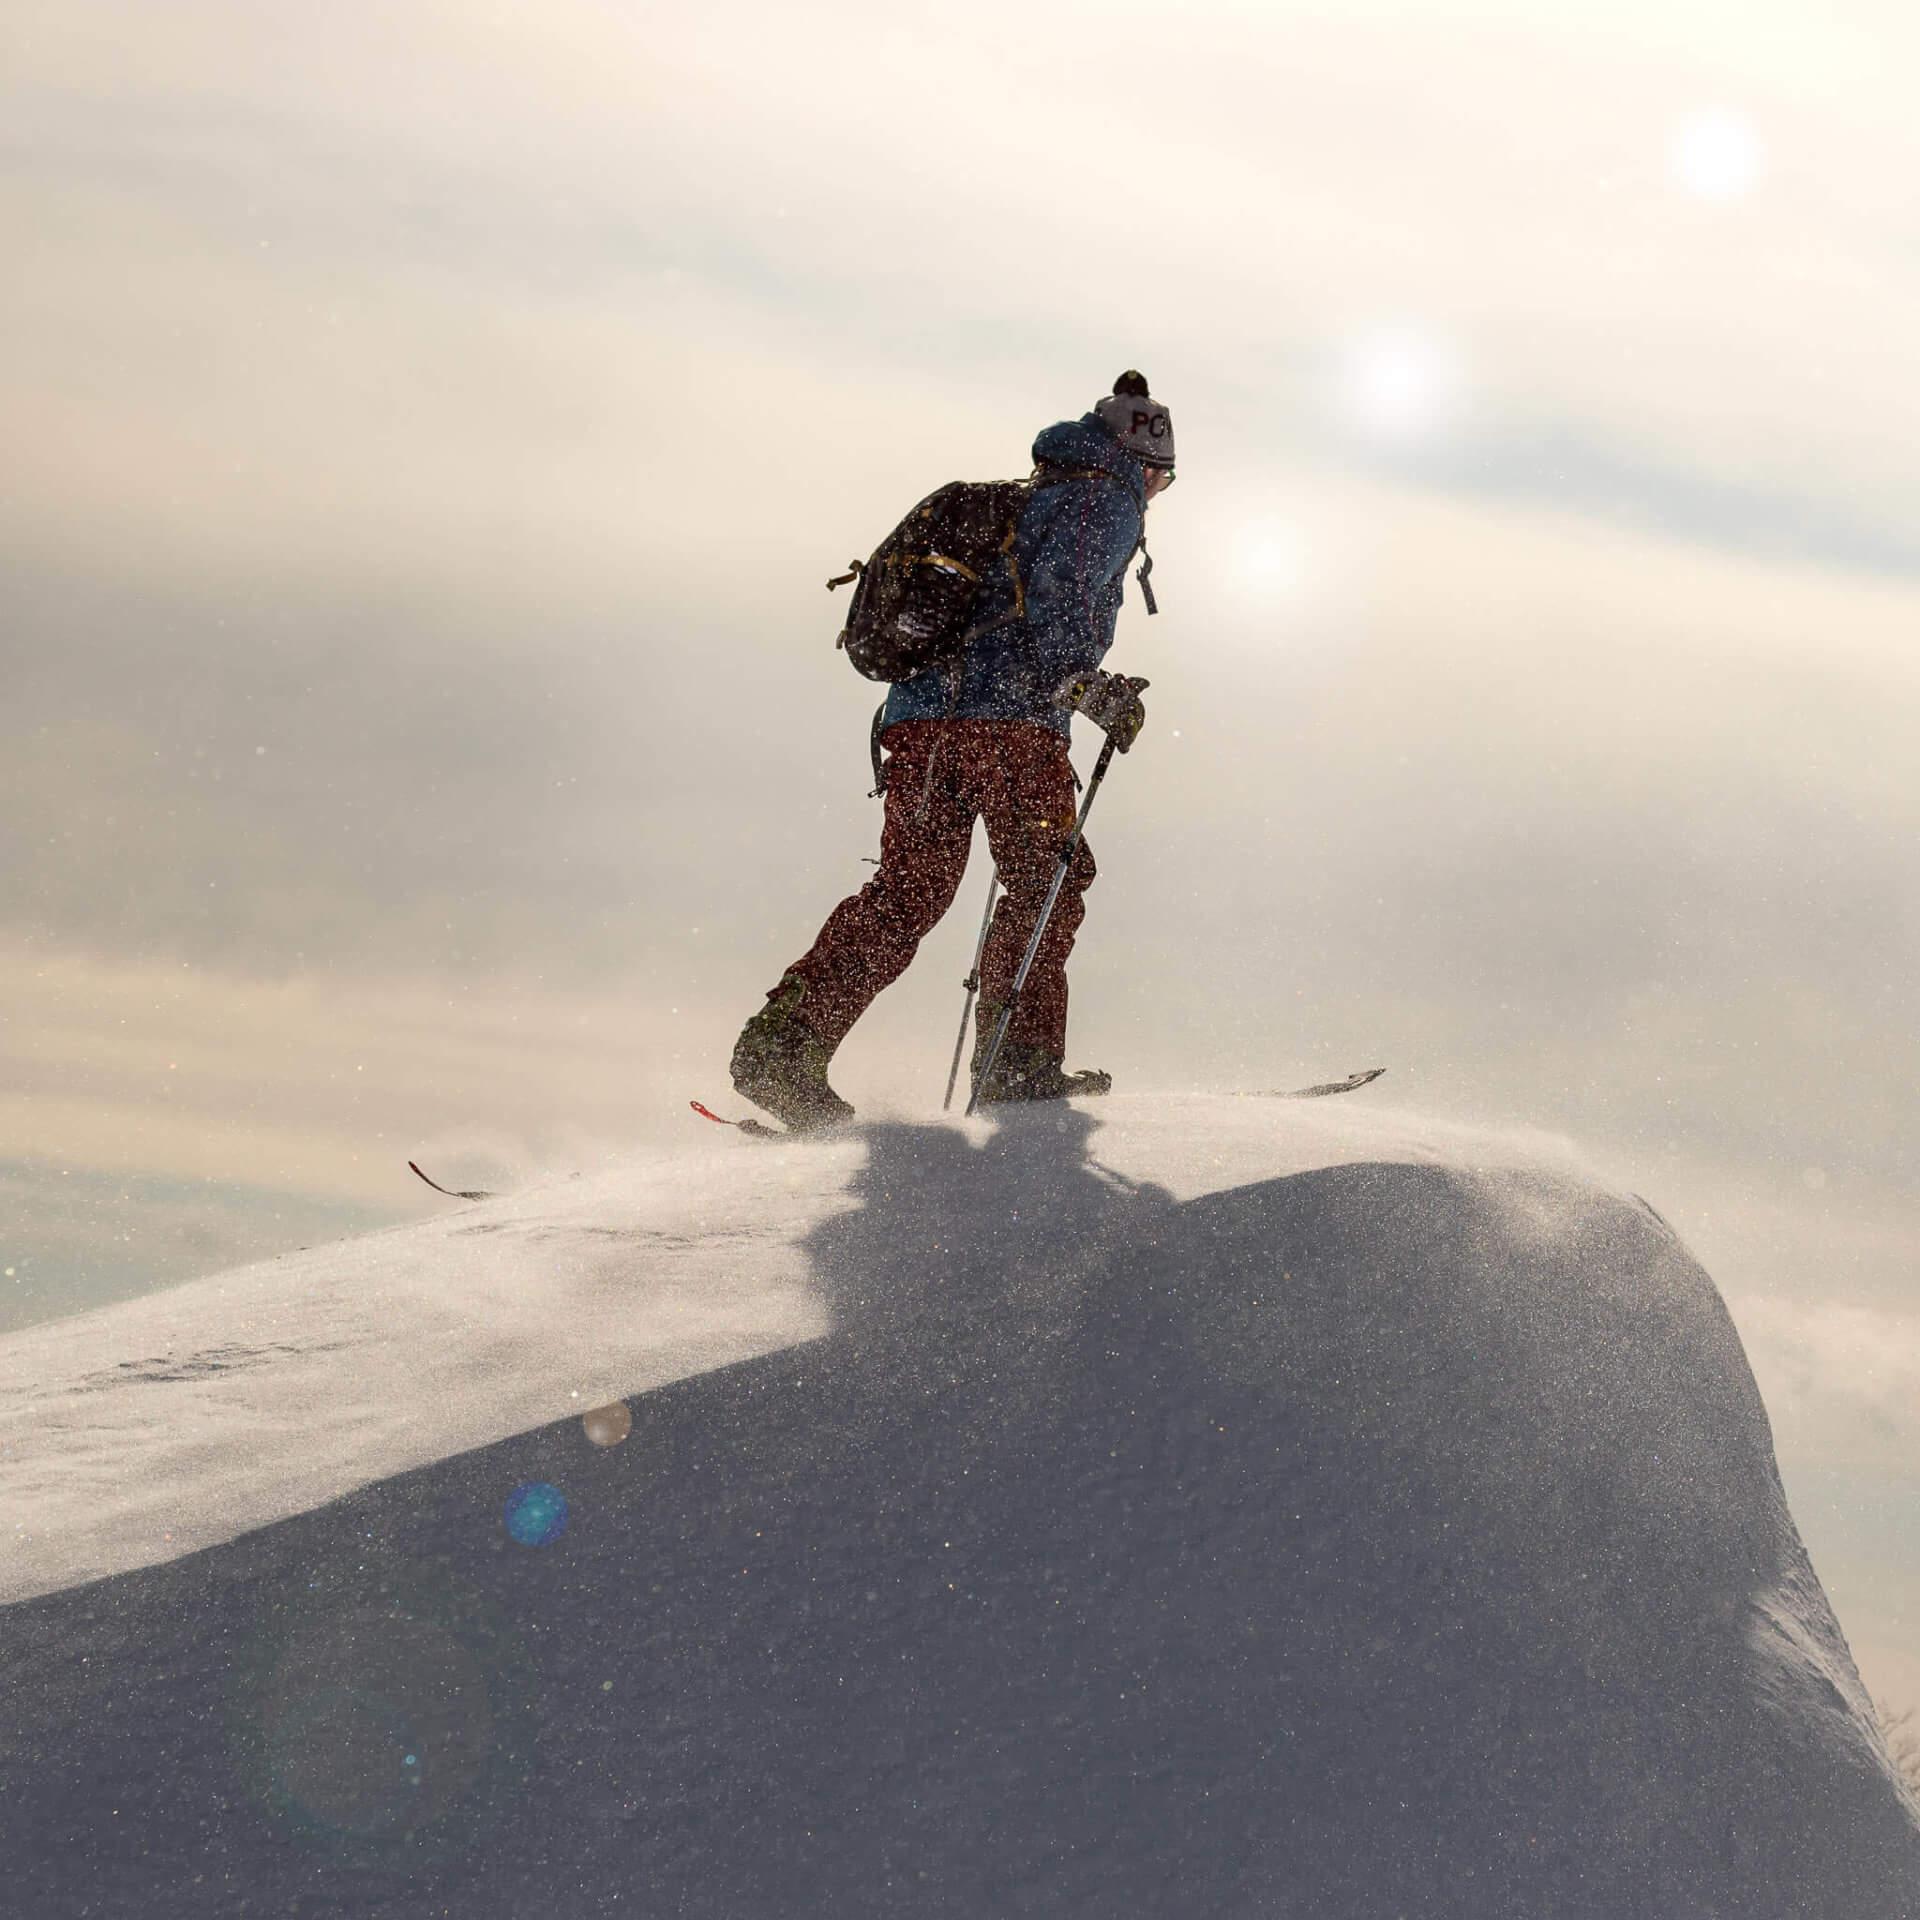 Vadim Stolyarov - Mountain Sports and Lifestyle. 2019